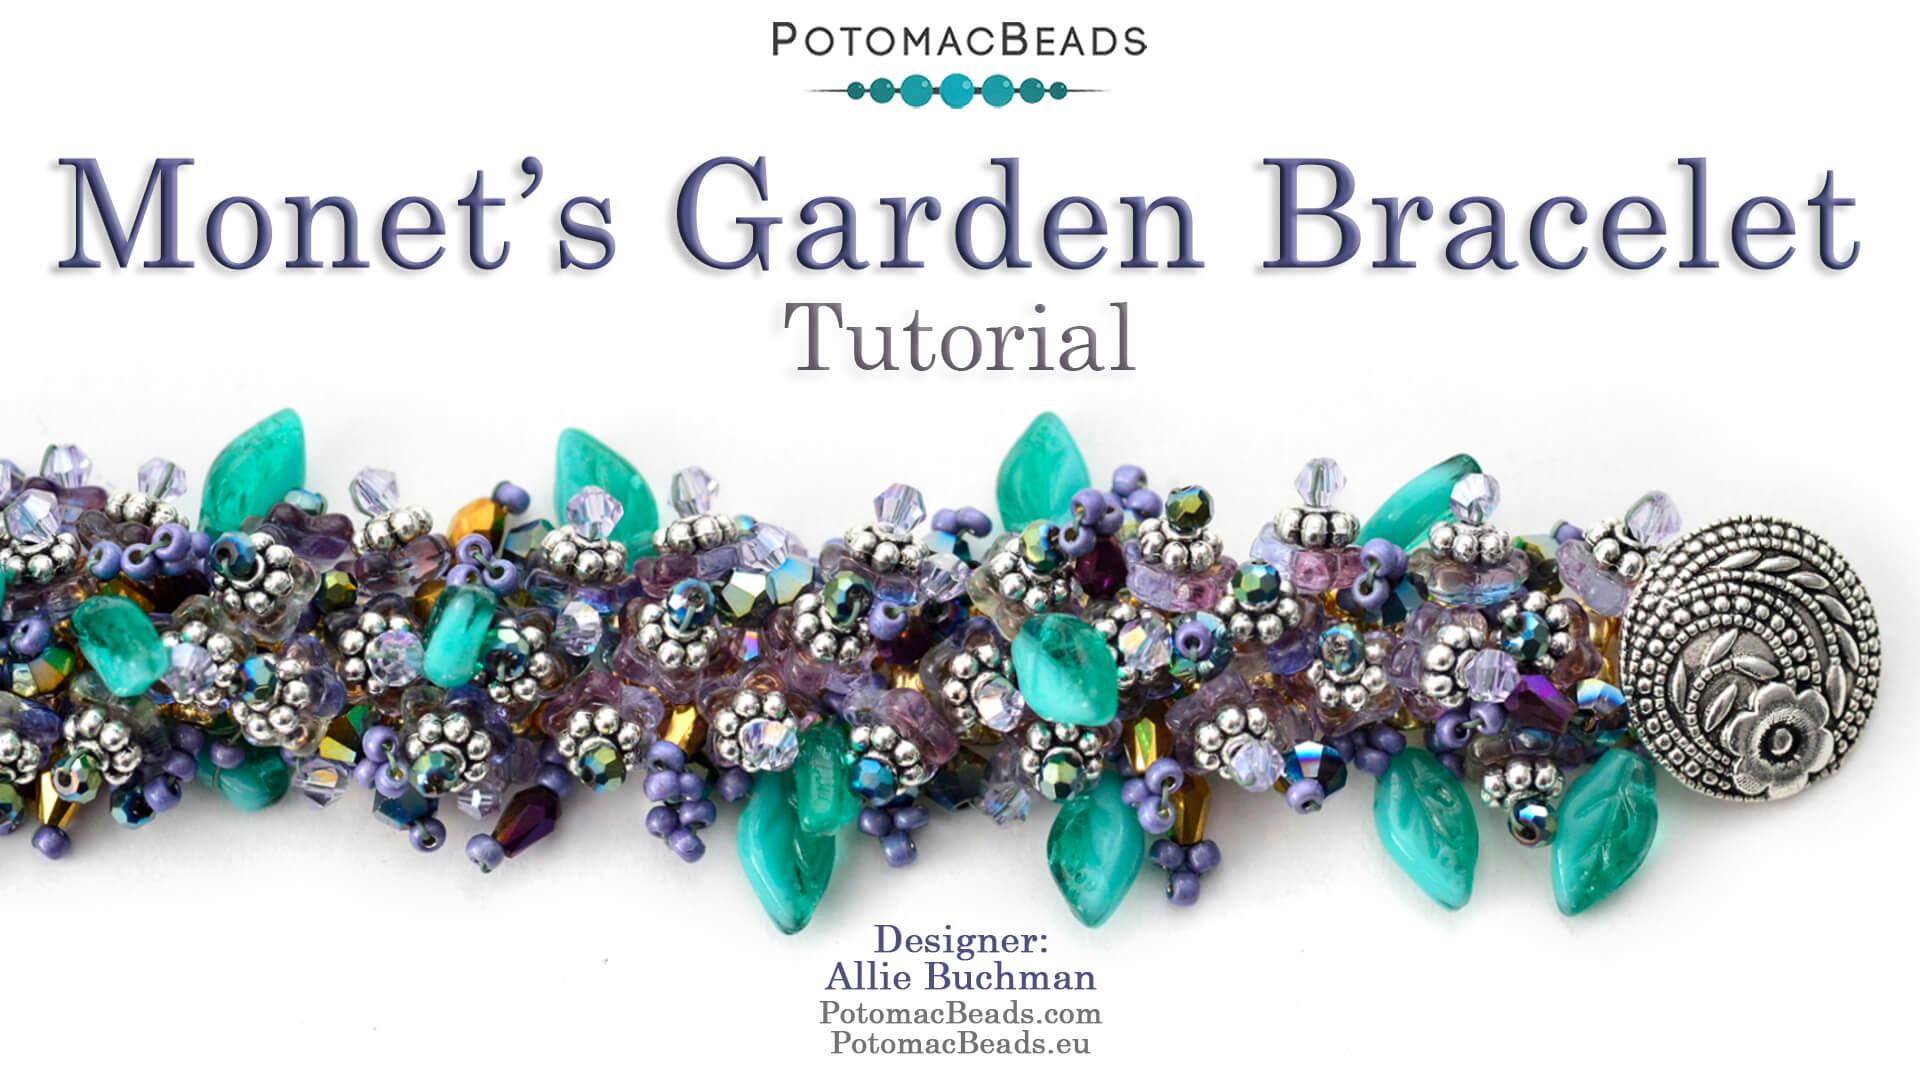 How to Bead Jewelry / Beading Tutorials & Jewel Making Videos / Bracelet Projects / Monet's Garden Bracelet Tutorial